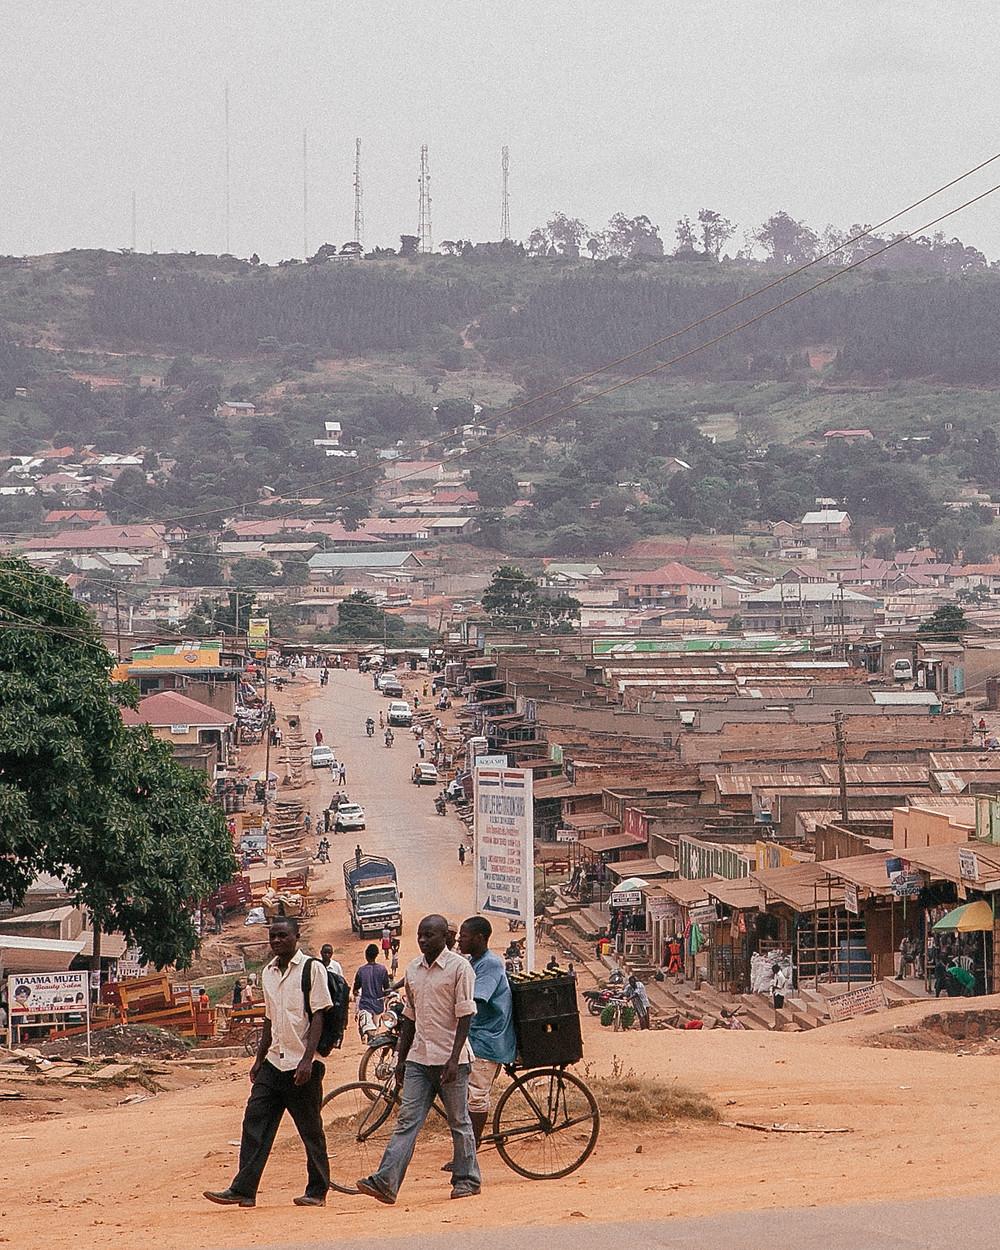 Uganda Streeets